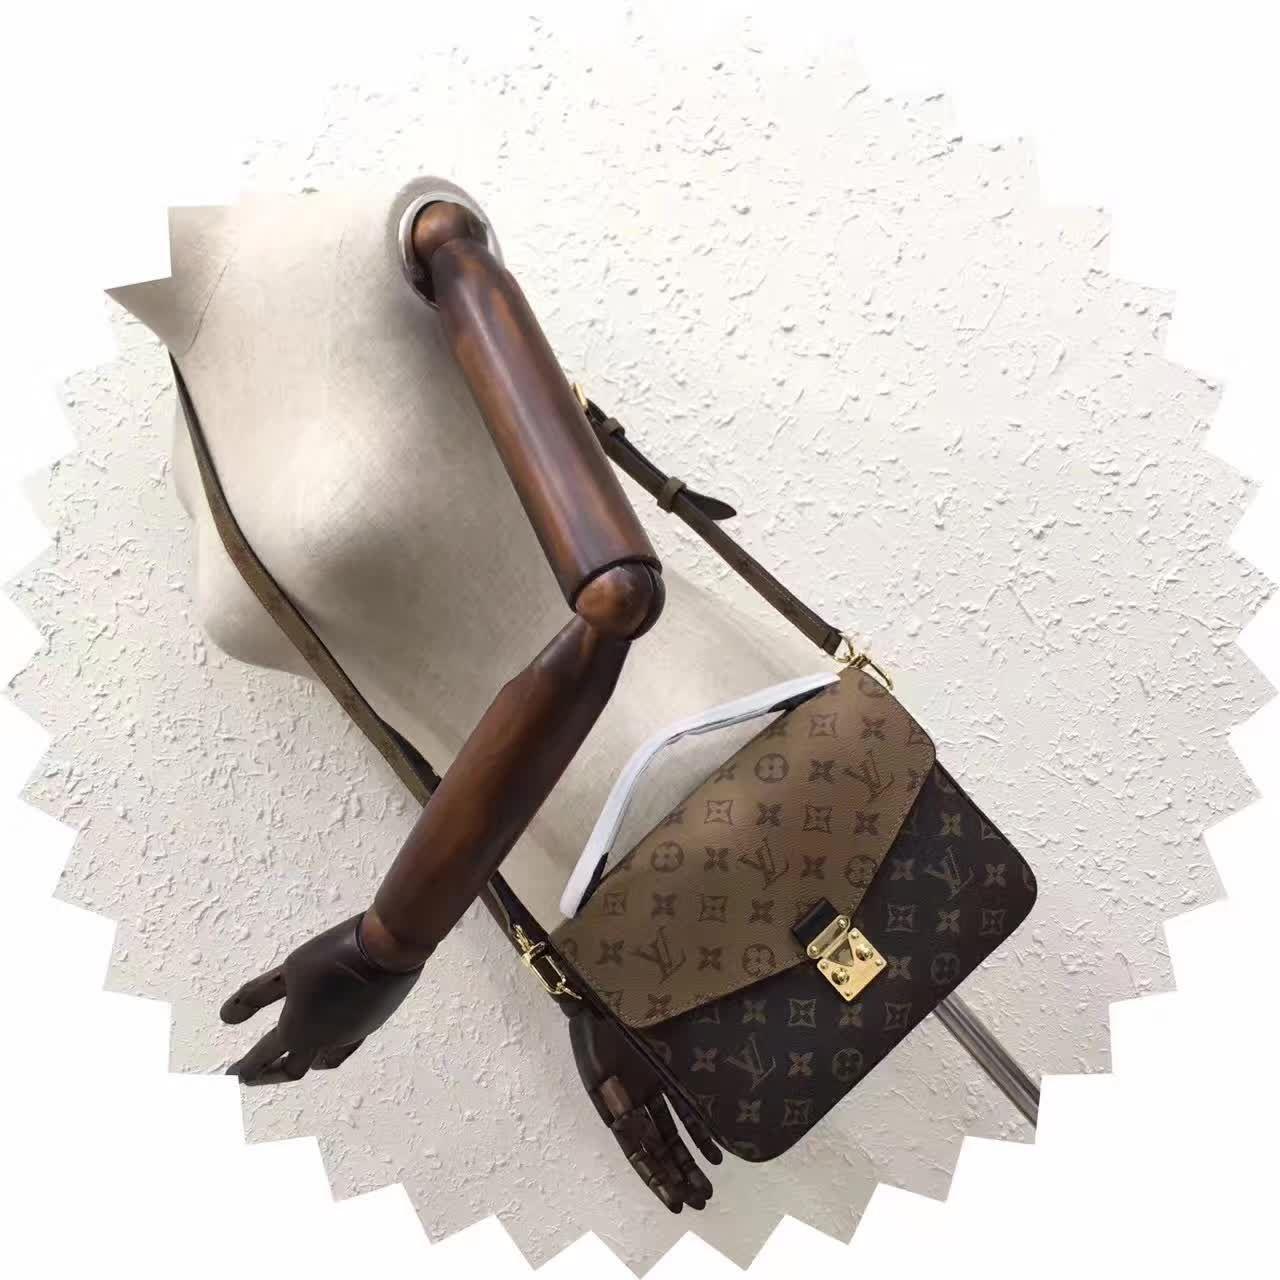 417684b337d M41465 NEW HOT WOMEN CLOTHING SHOULDER BAG PURSE POCHETTE METIS BROWN